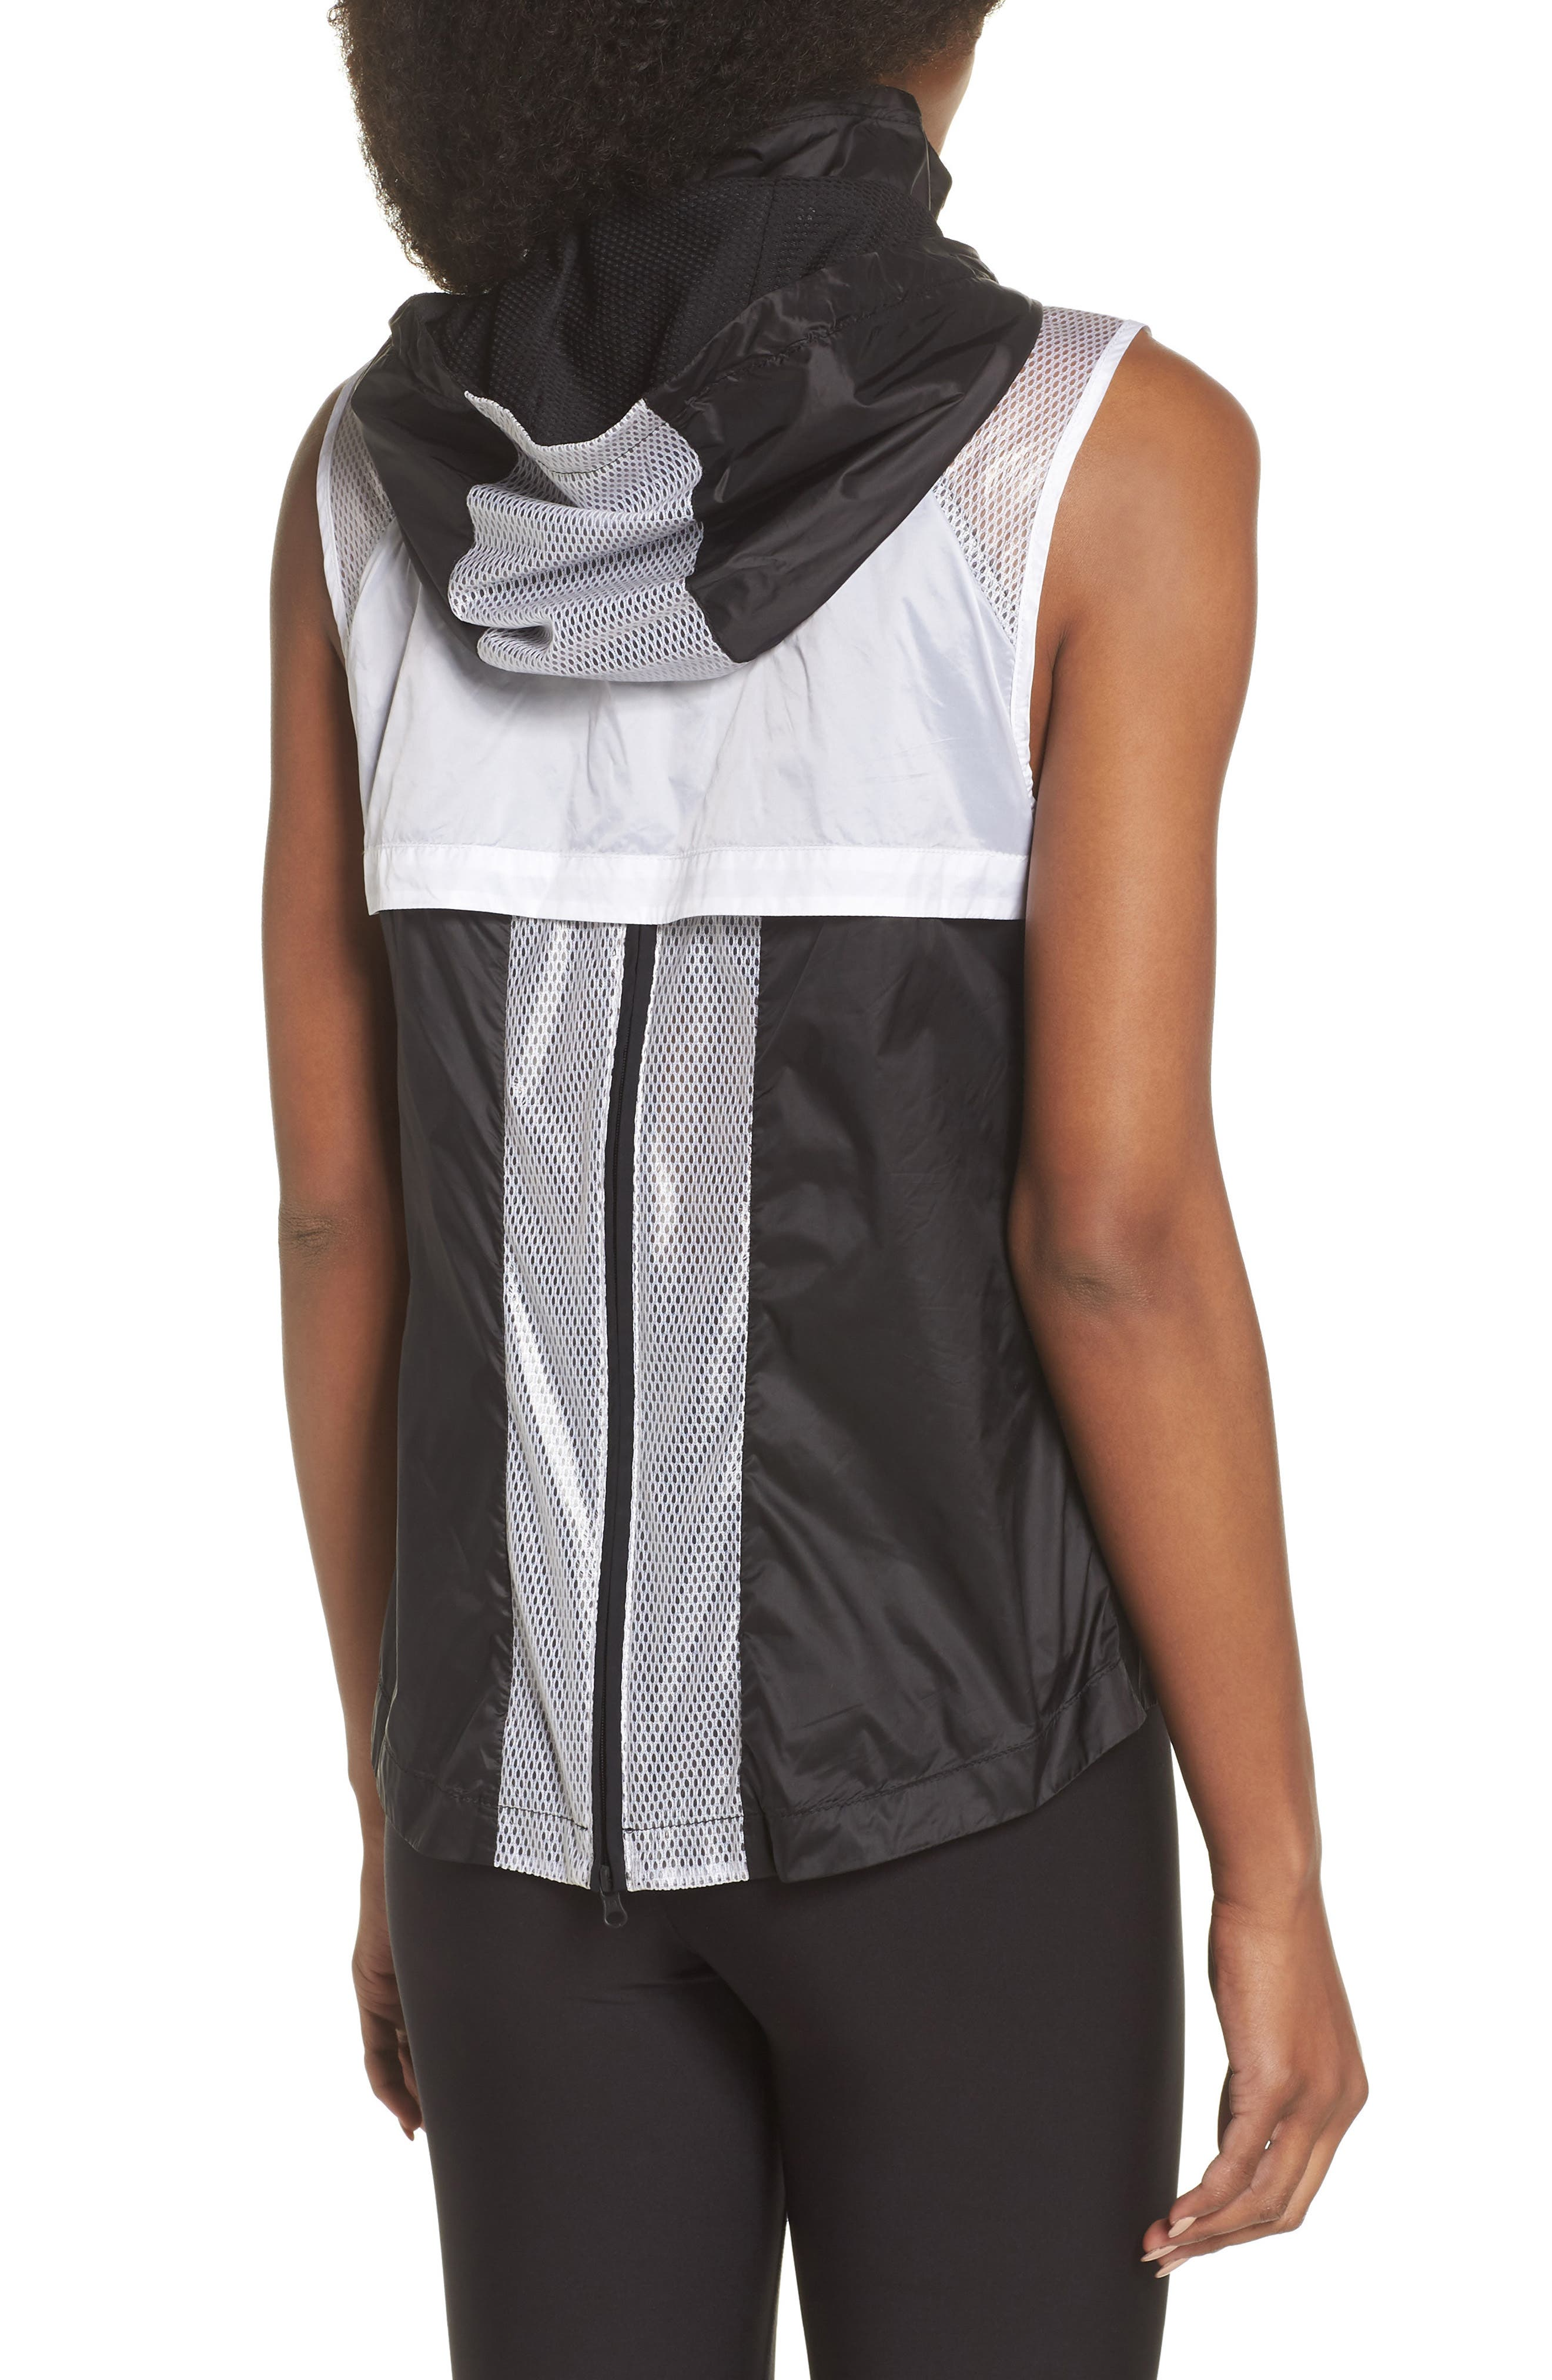 Moonlight Vest,                             Alternate thumbnail 2, color,                             Black